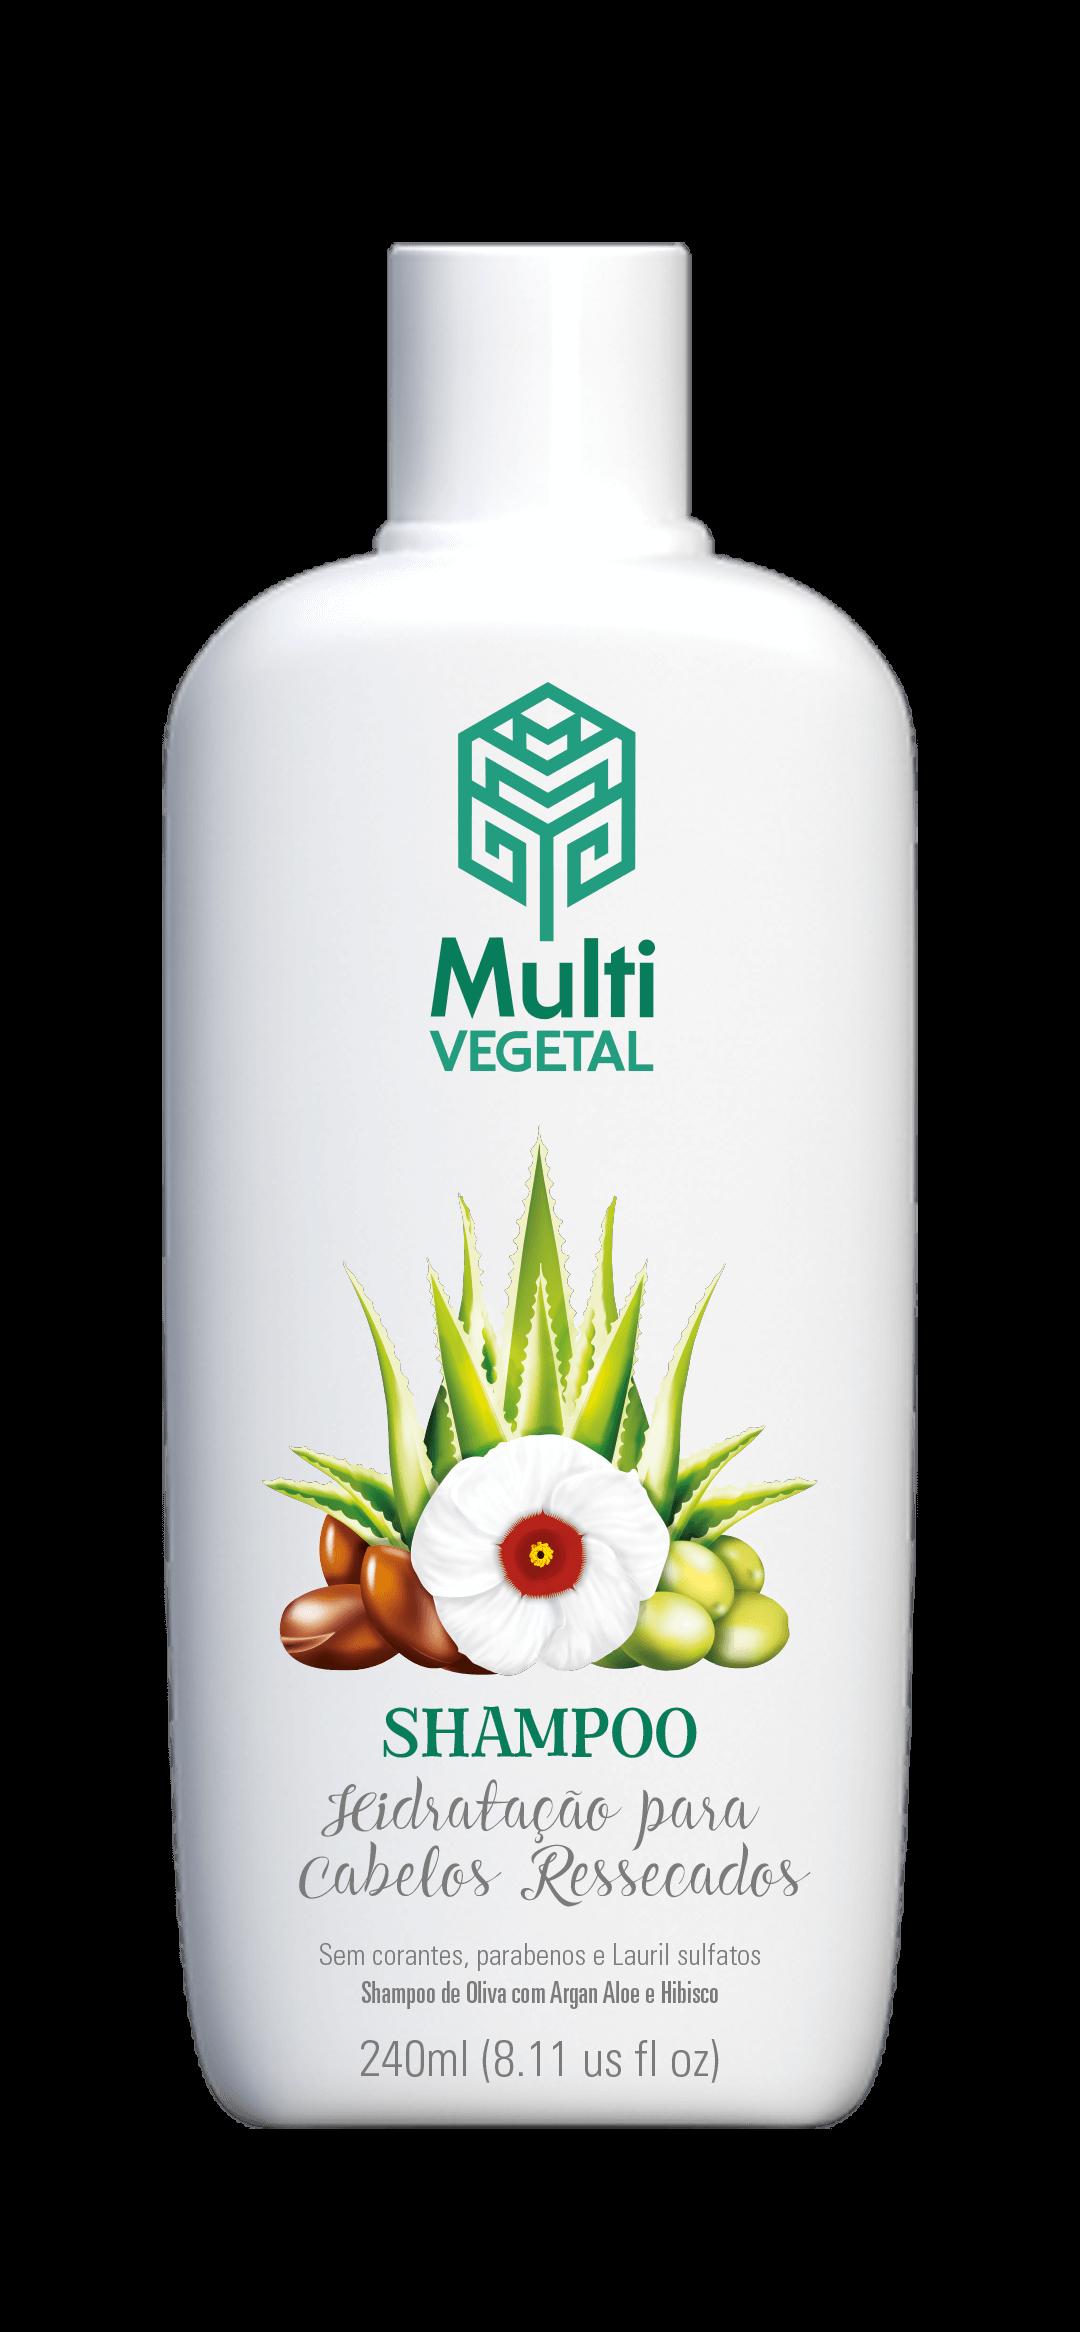 Shampoo de Oliva com Argan, Aloe e Hibisco 240ml